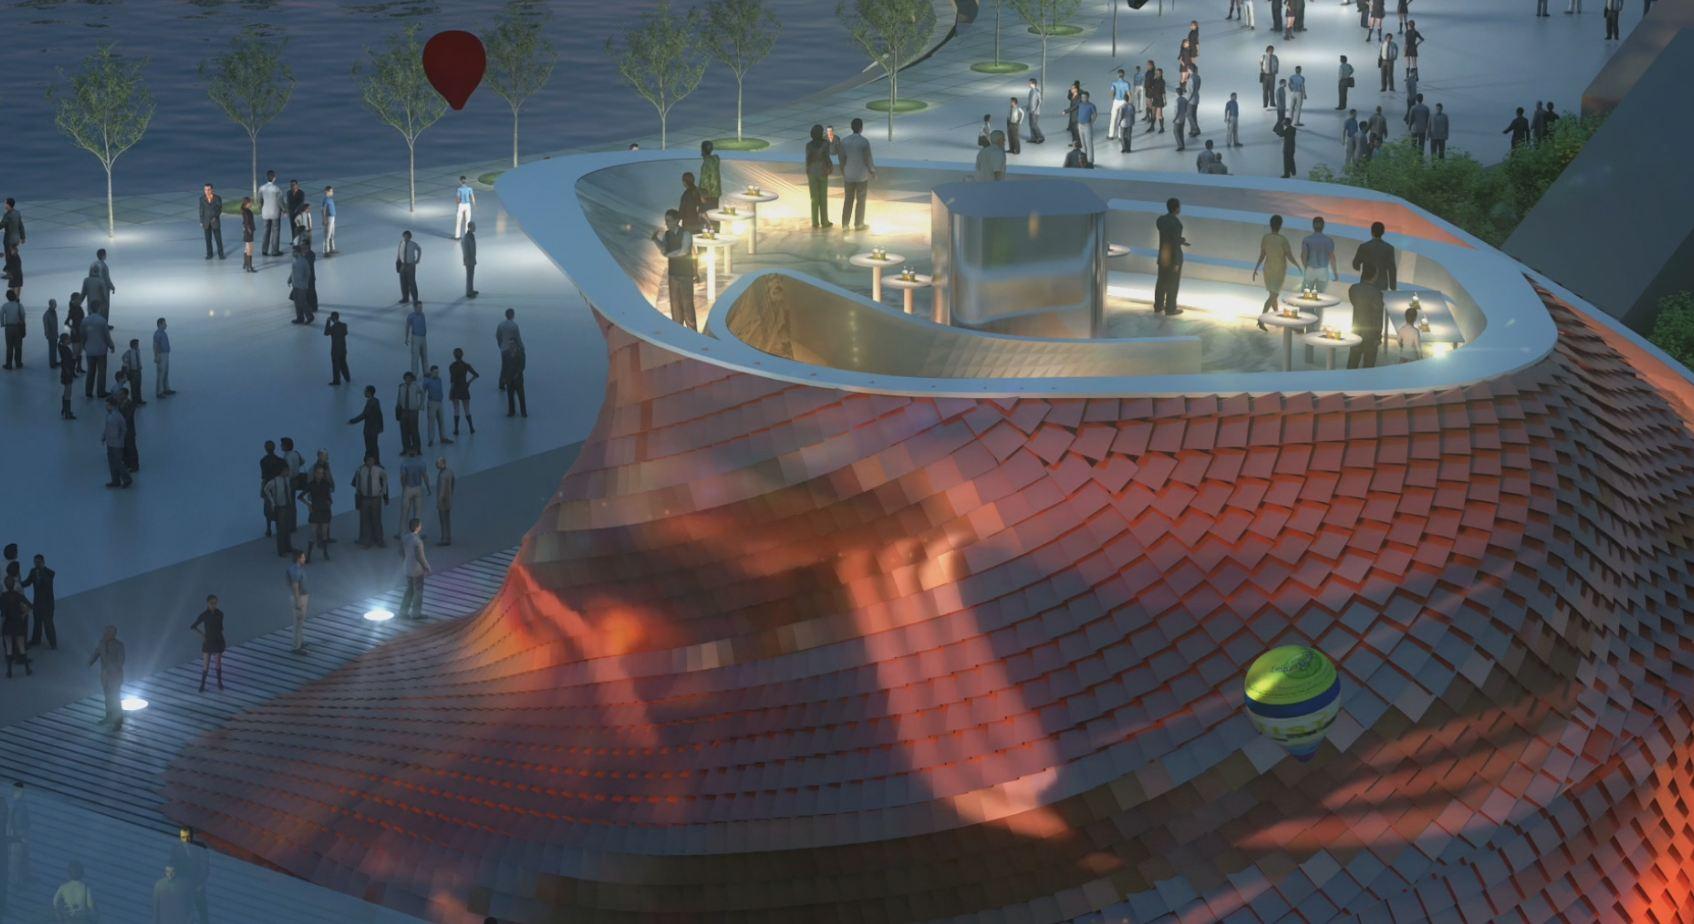 Video Inside The Vanke Pavilion 2015 Expo Milan Libeskind